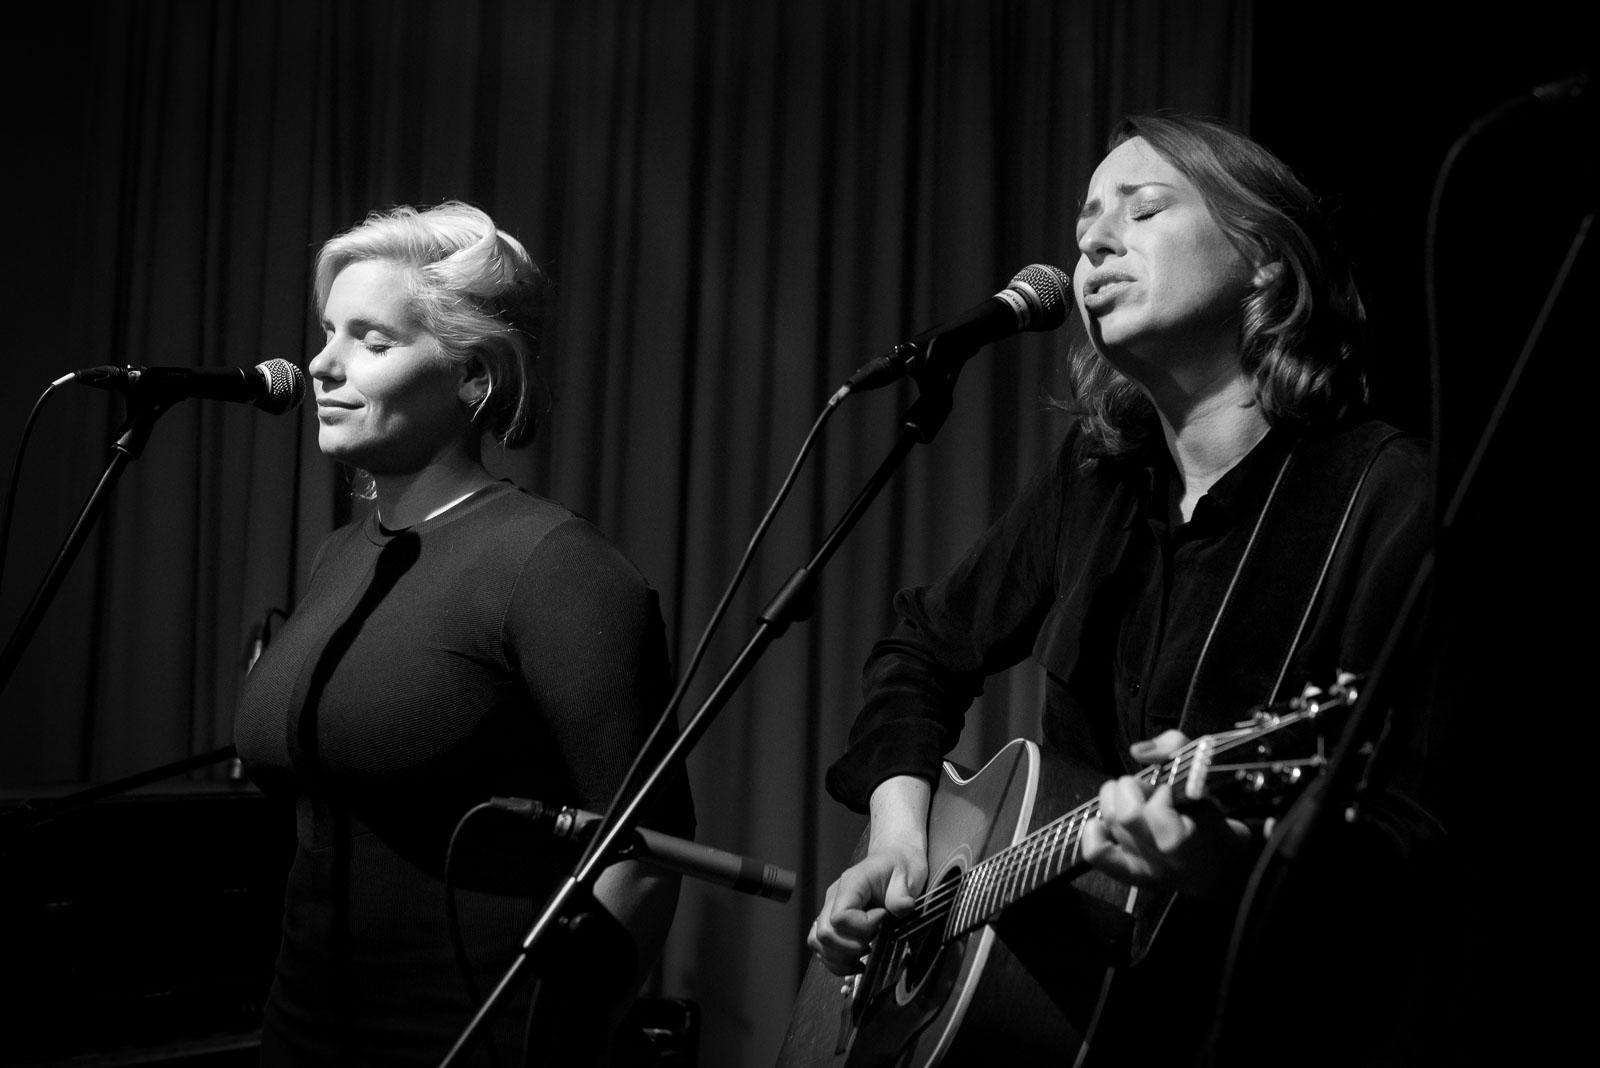 Stephanie Struijk Parelsessies Concertfotografie